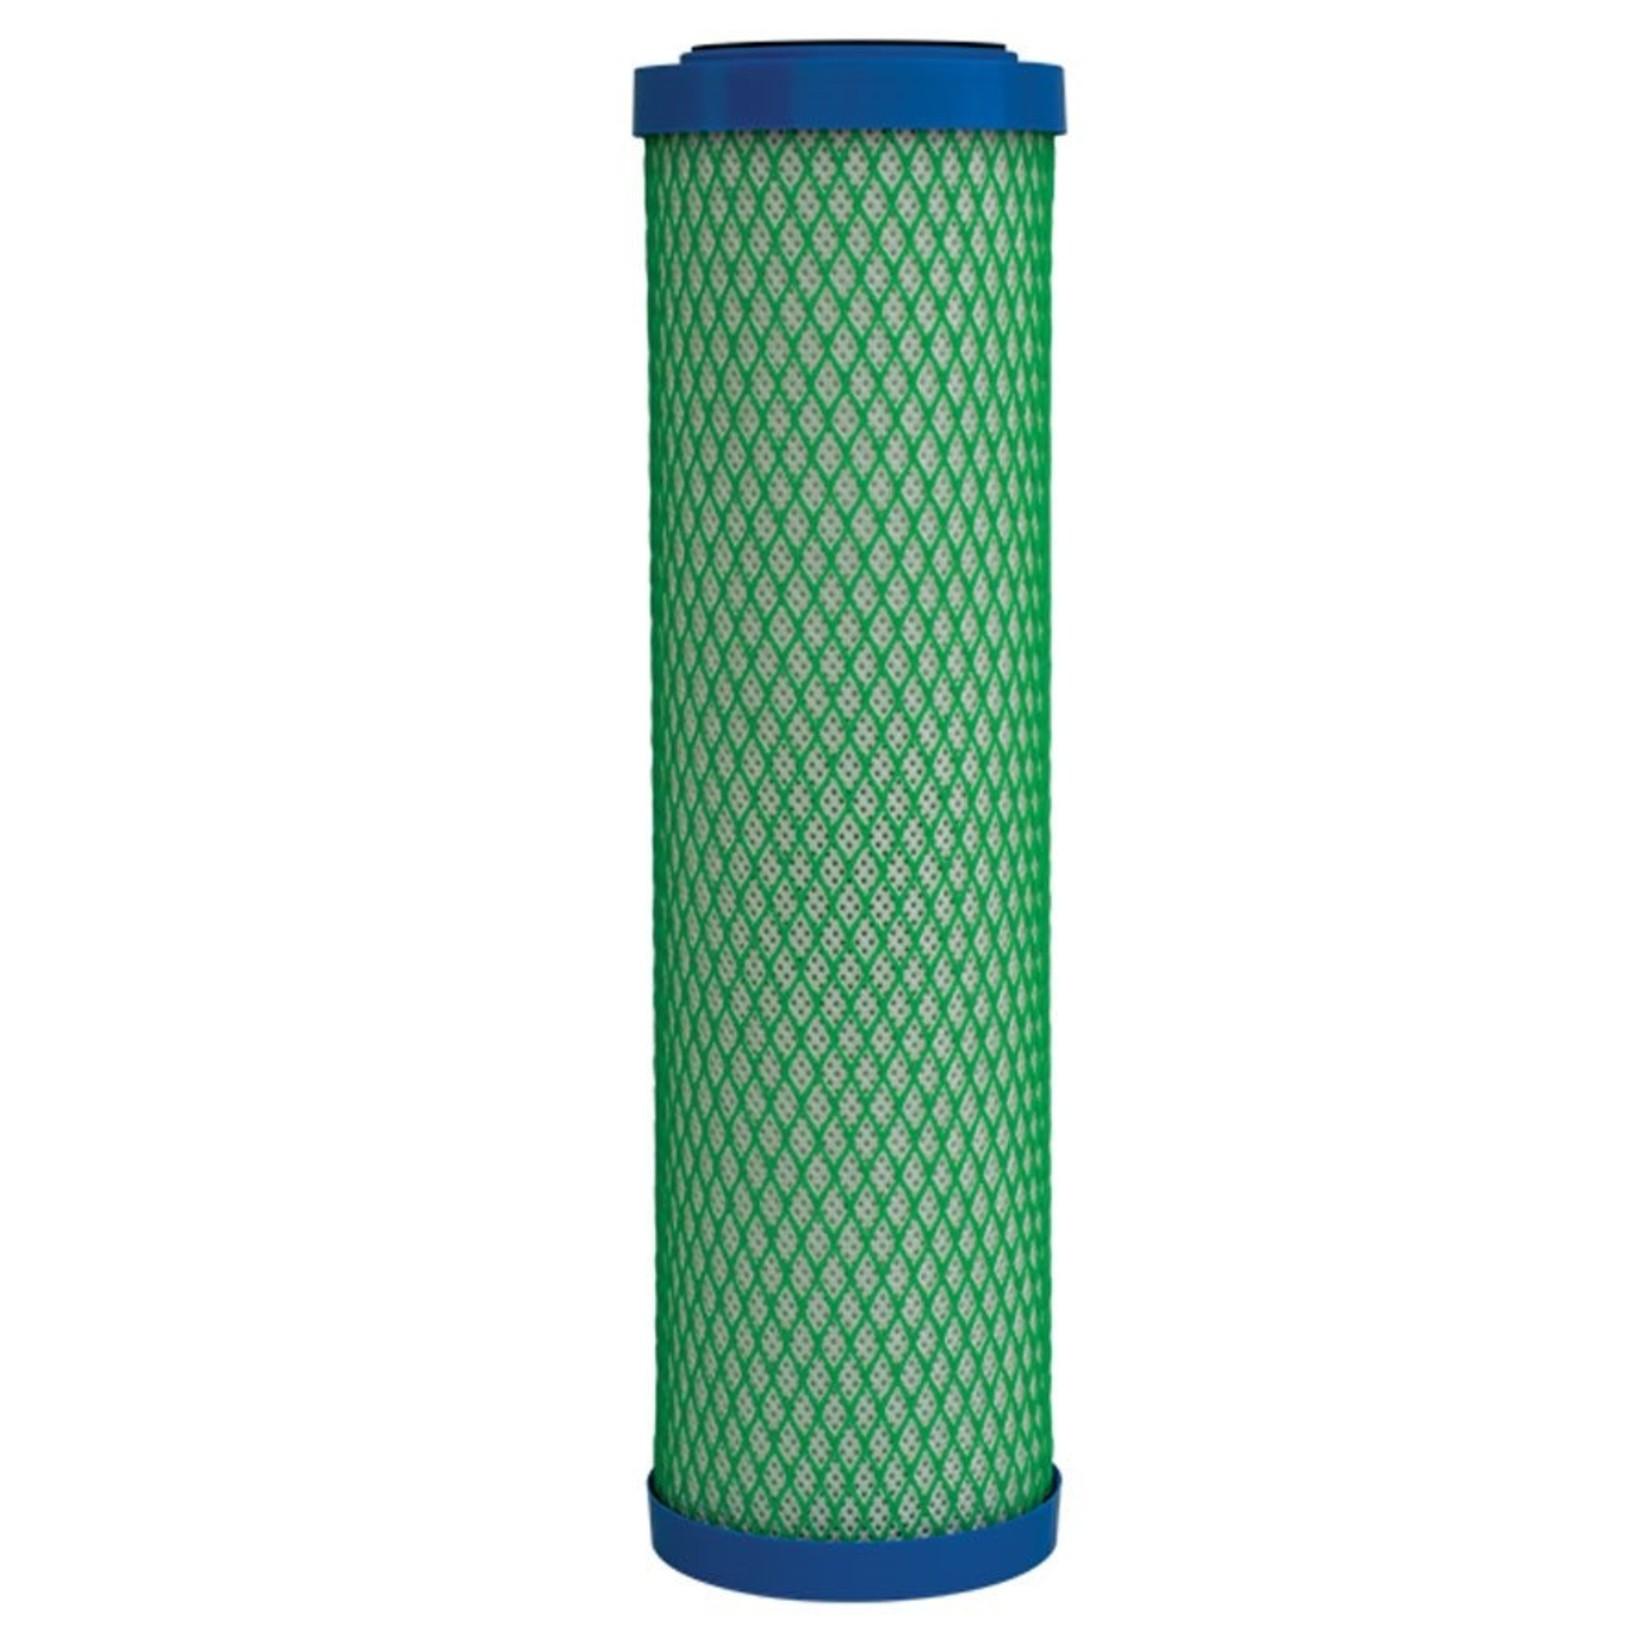 Hydrologic HYDROLOGIC STEALTH-RO / SMALLBOY GREEN COCO CARBON FILTER